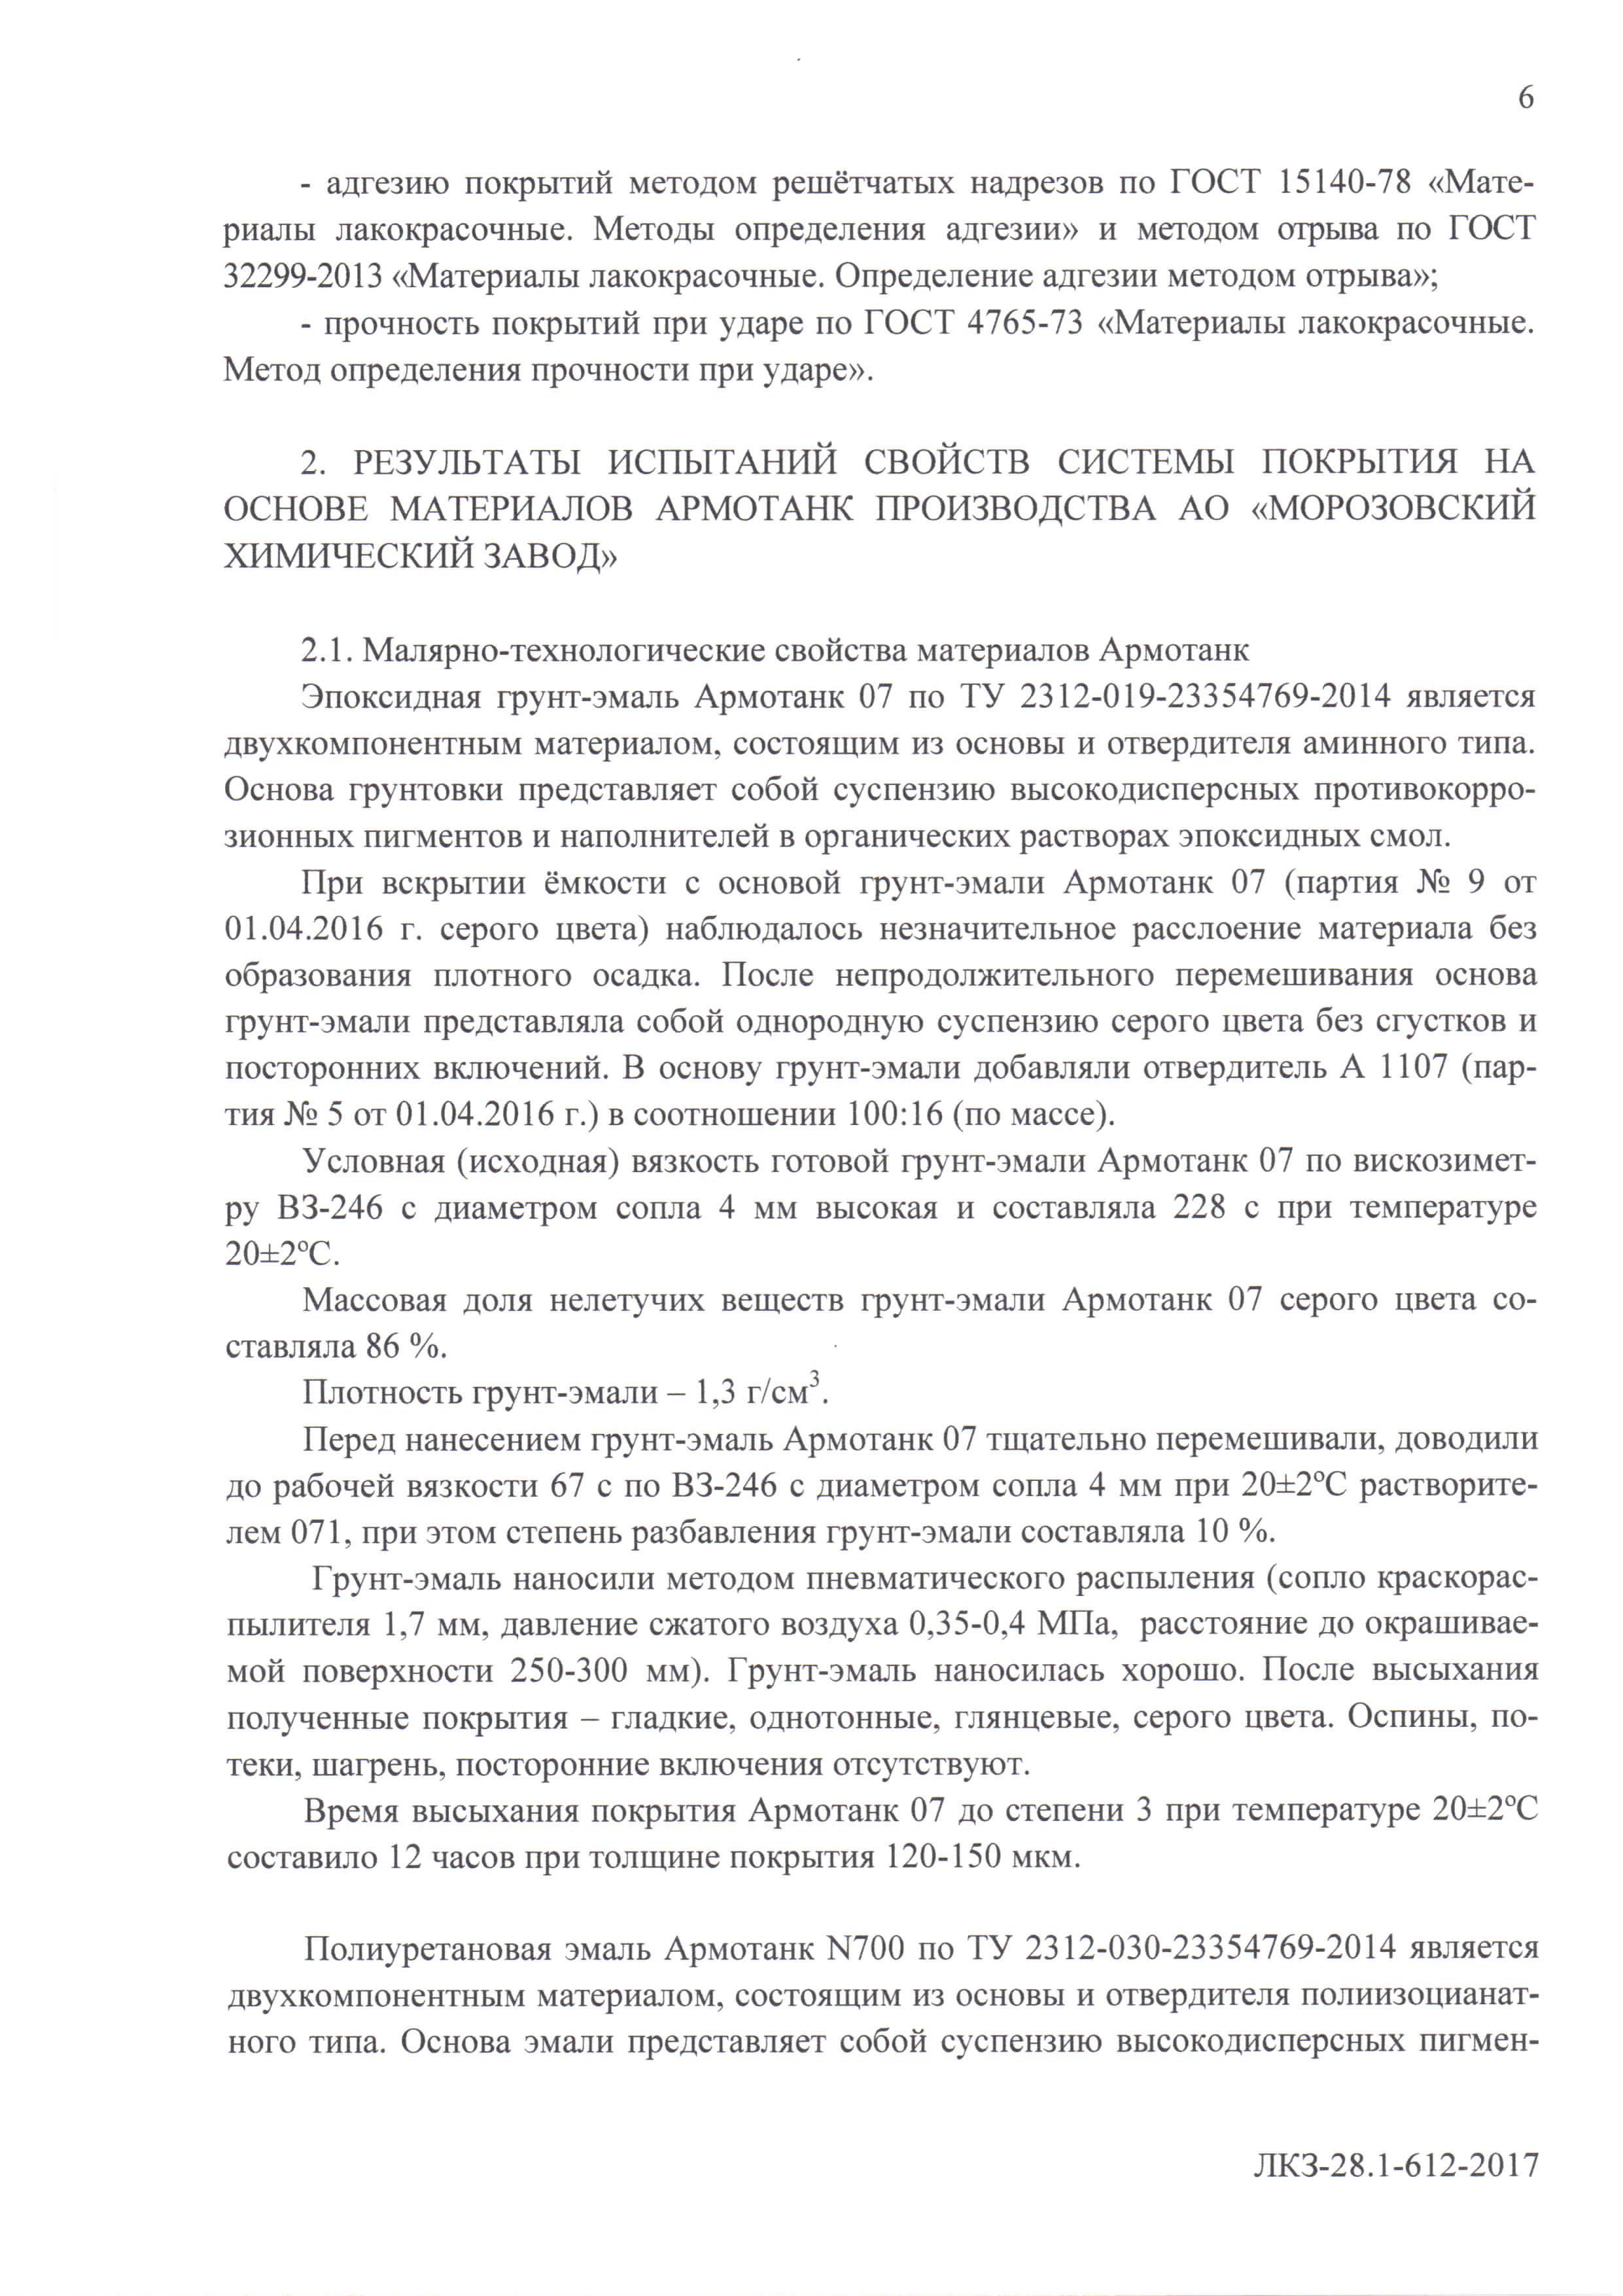 ЦНИИПСК им.Мельникова Армотанк 07+N700, 25 лет УХЛ1_Страница_06